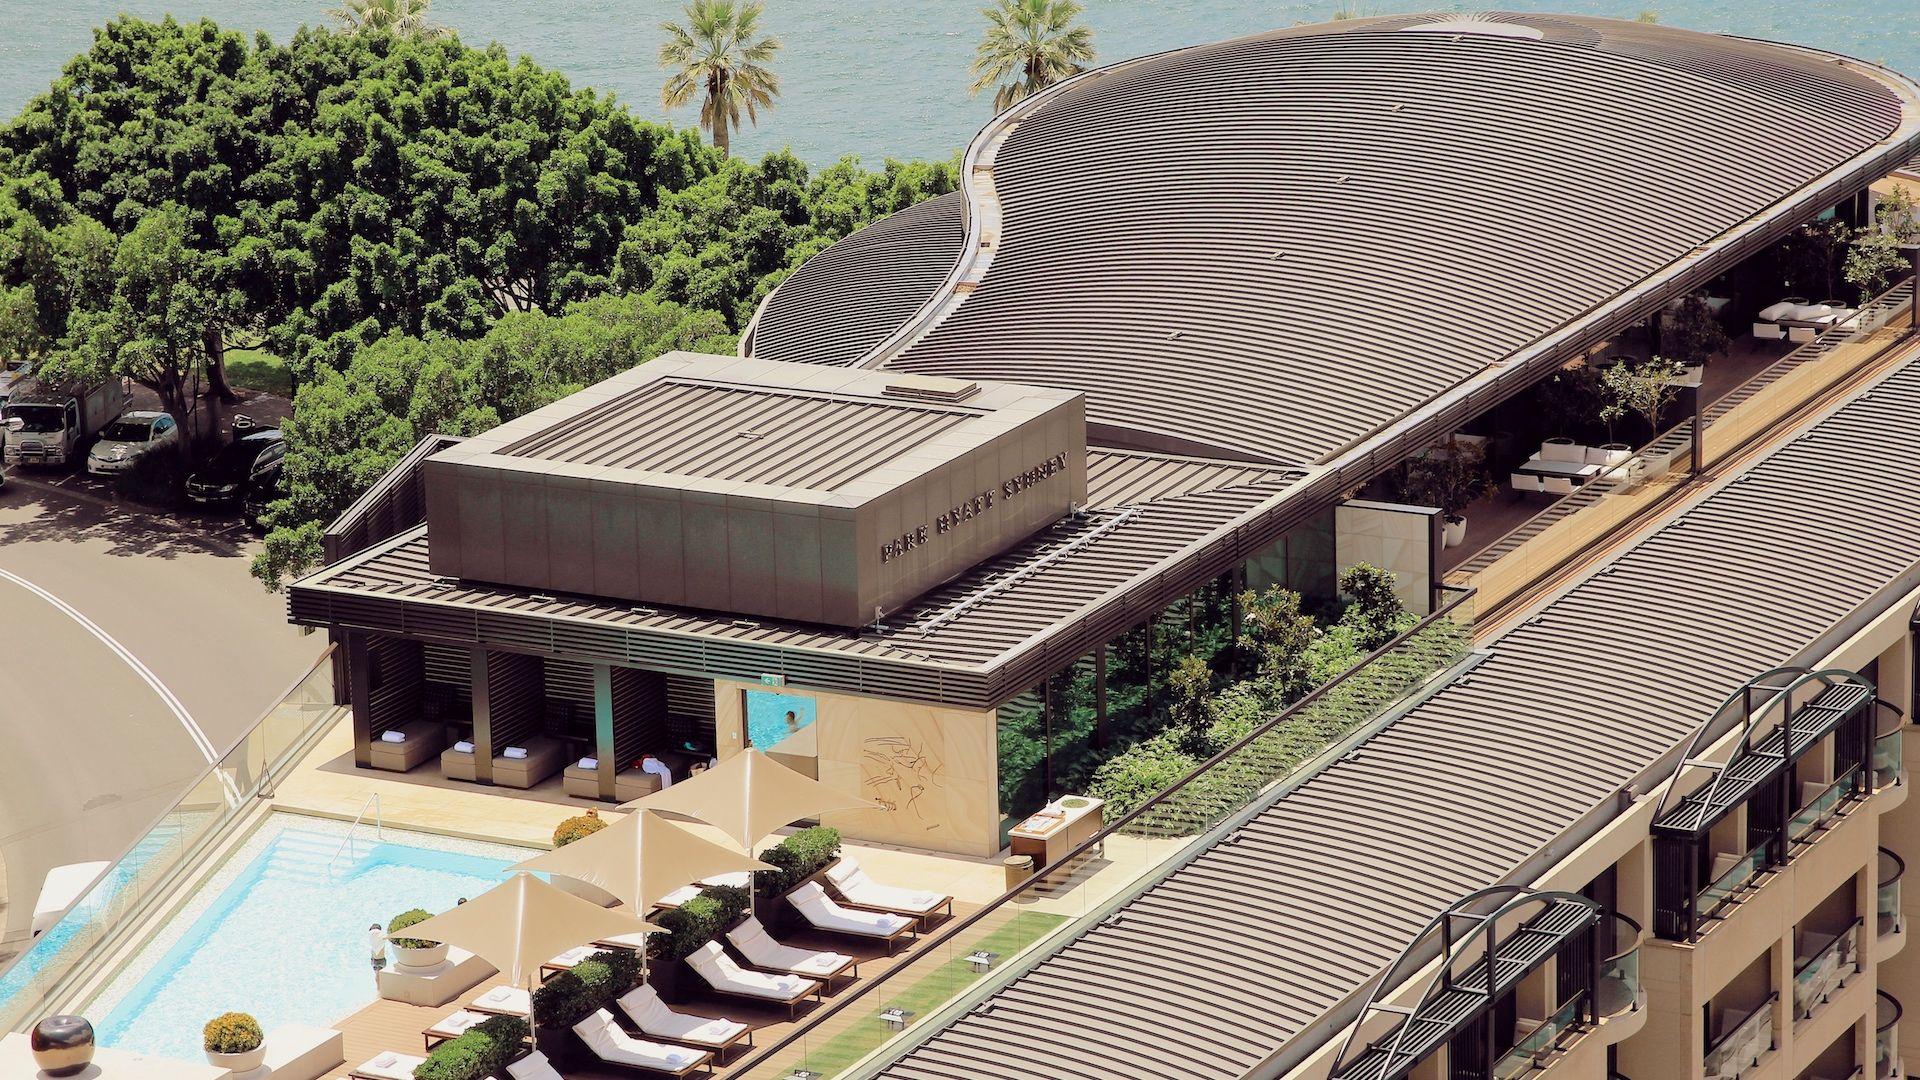 Hyatt Spa Sydney Review